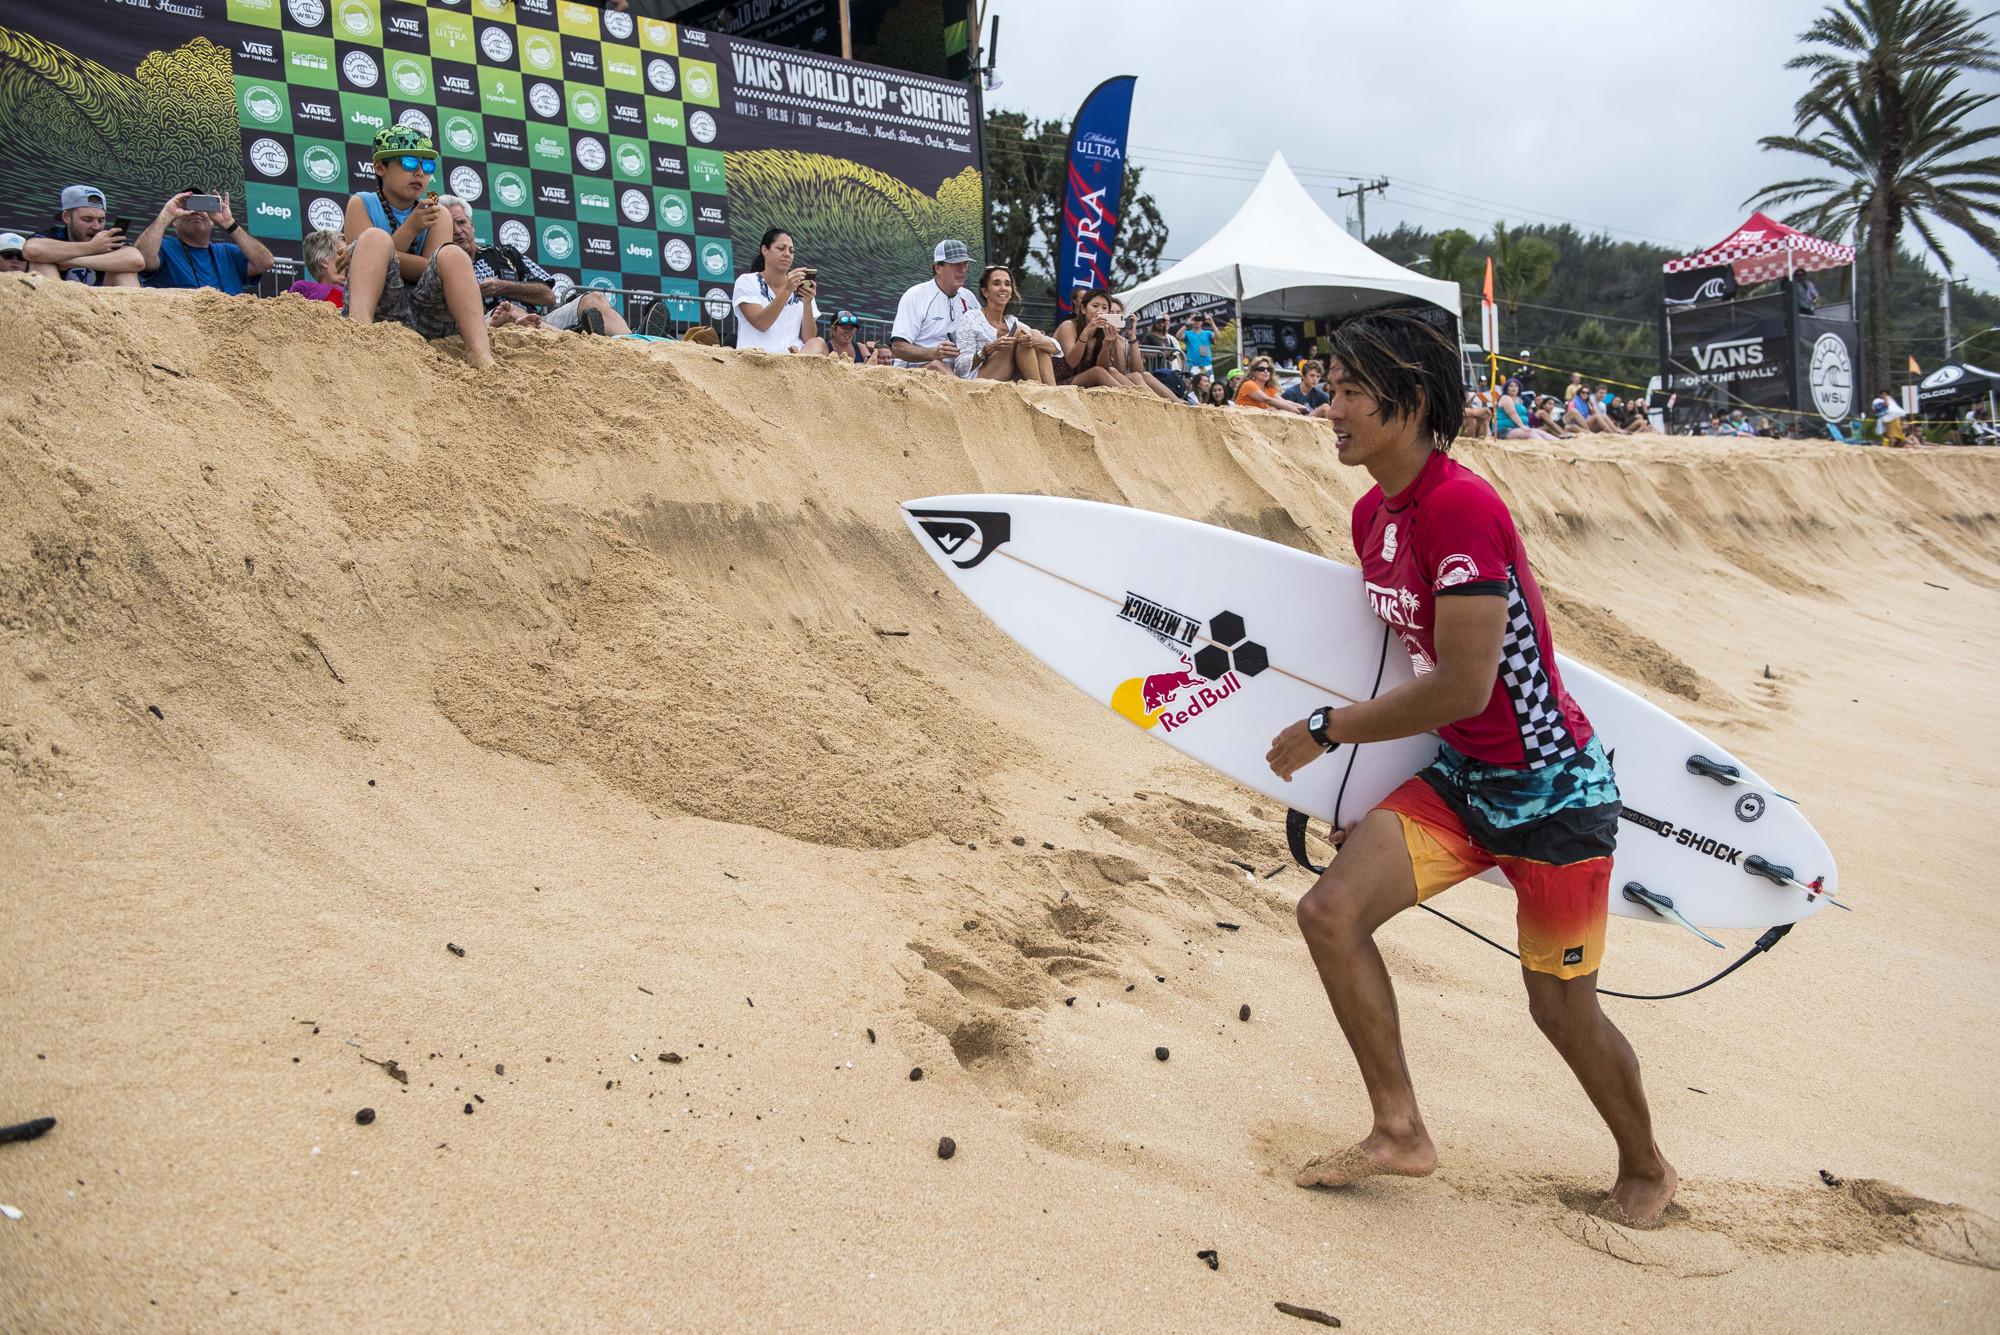 Conner coffin wins vans us open surf station surf report kanoa igarashi sunset beach nvjuhfo Image collections